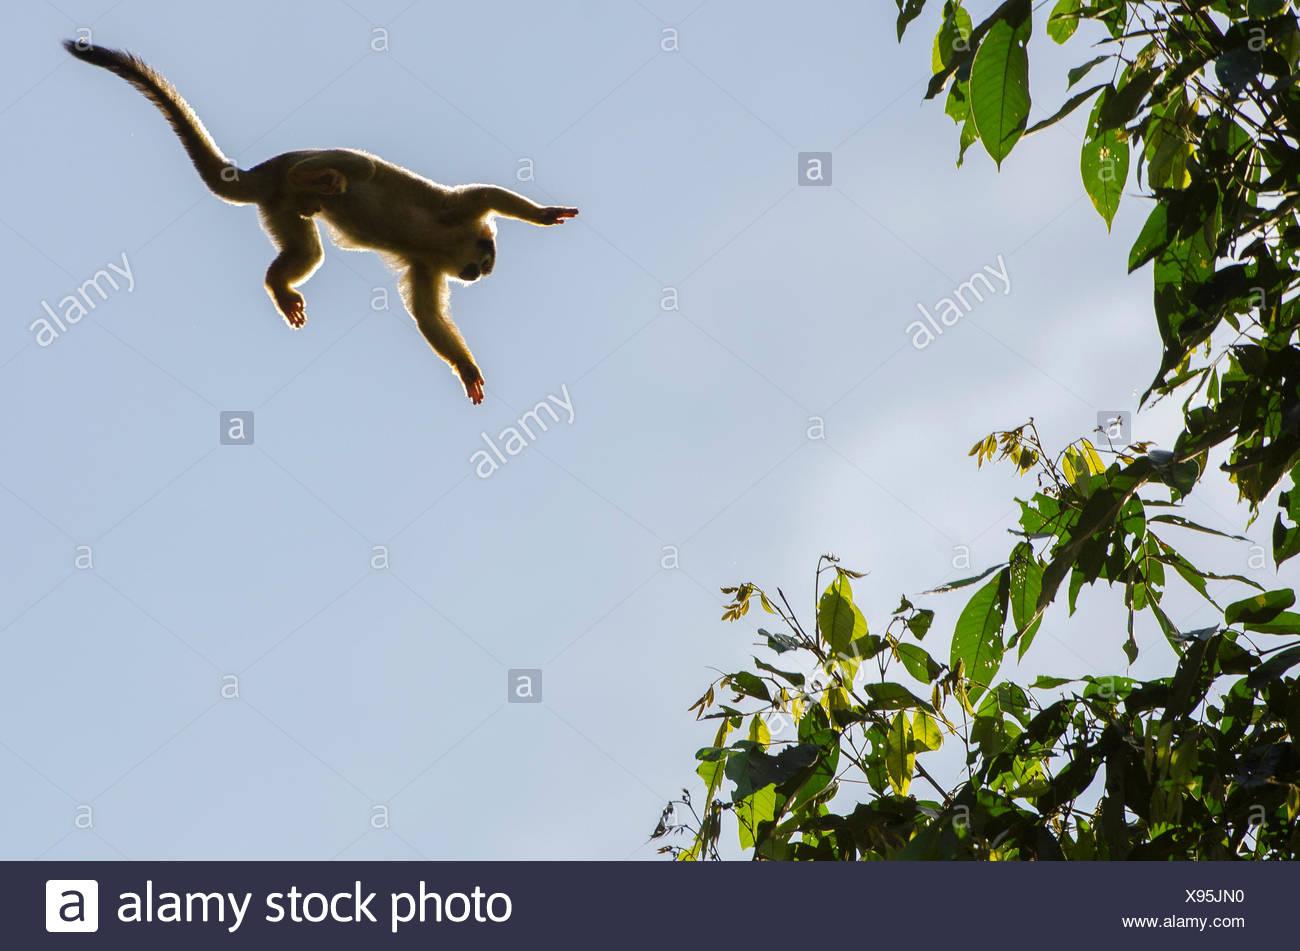 Singe-écureuil, Saimiri scireus, saut. Photo Stock